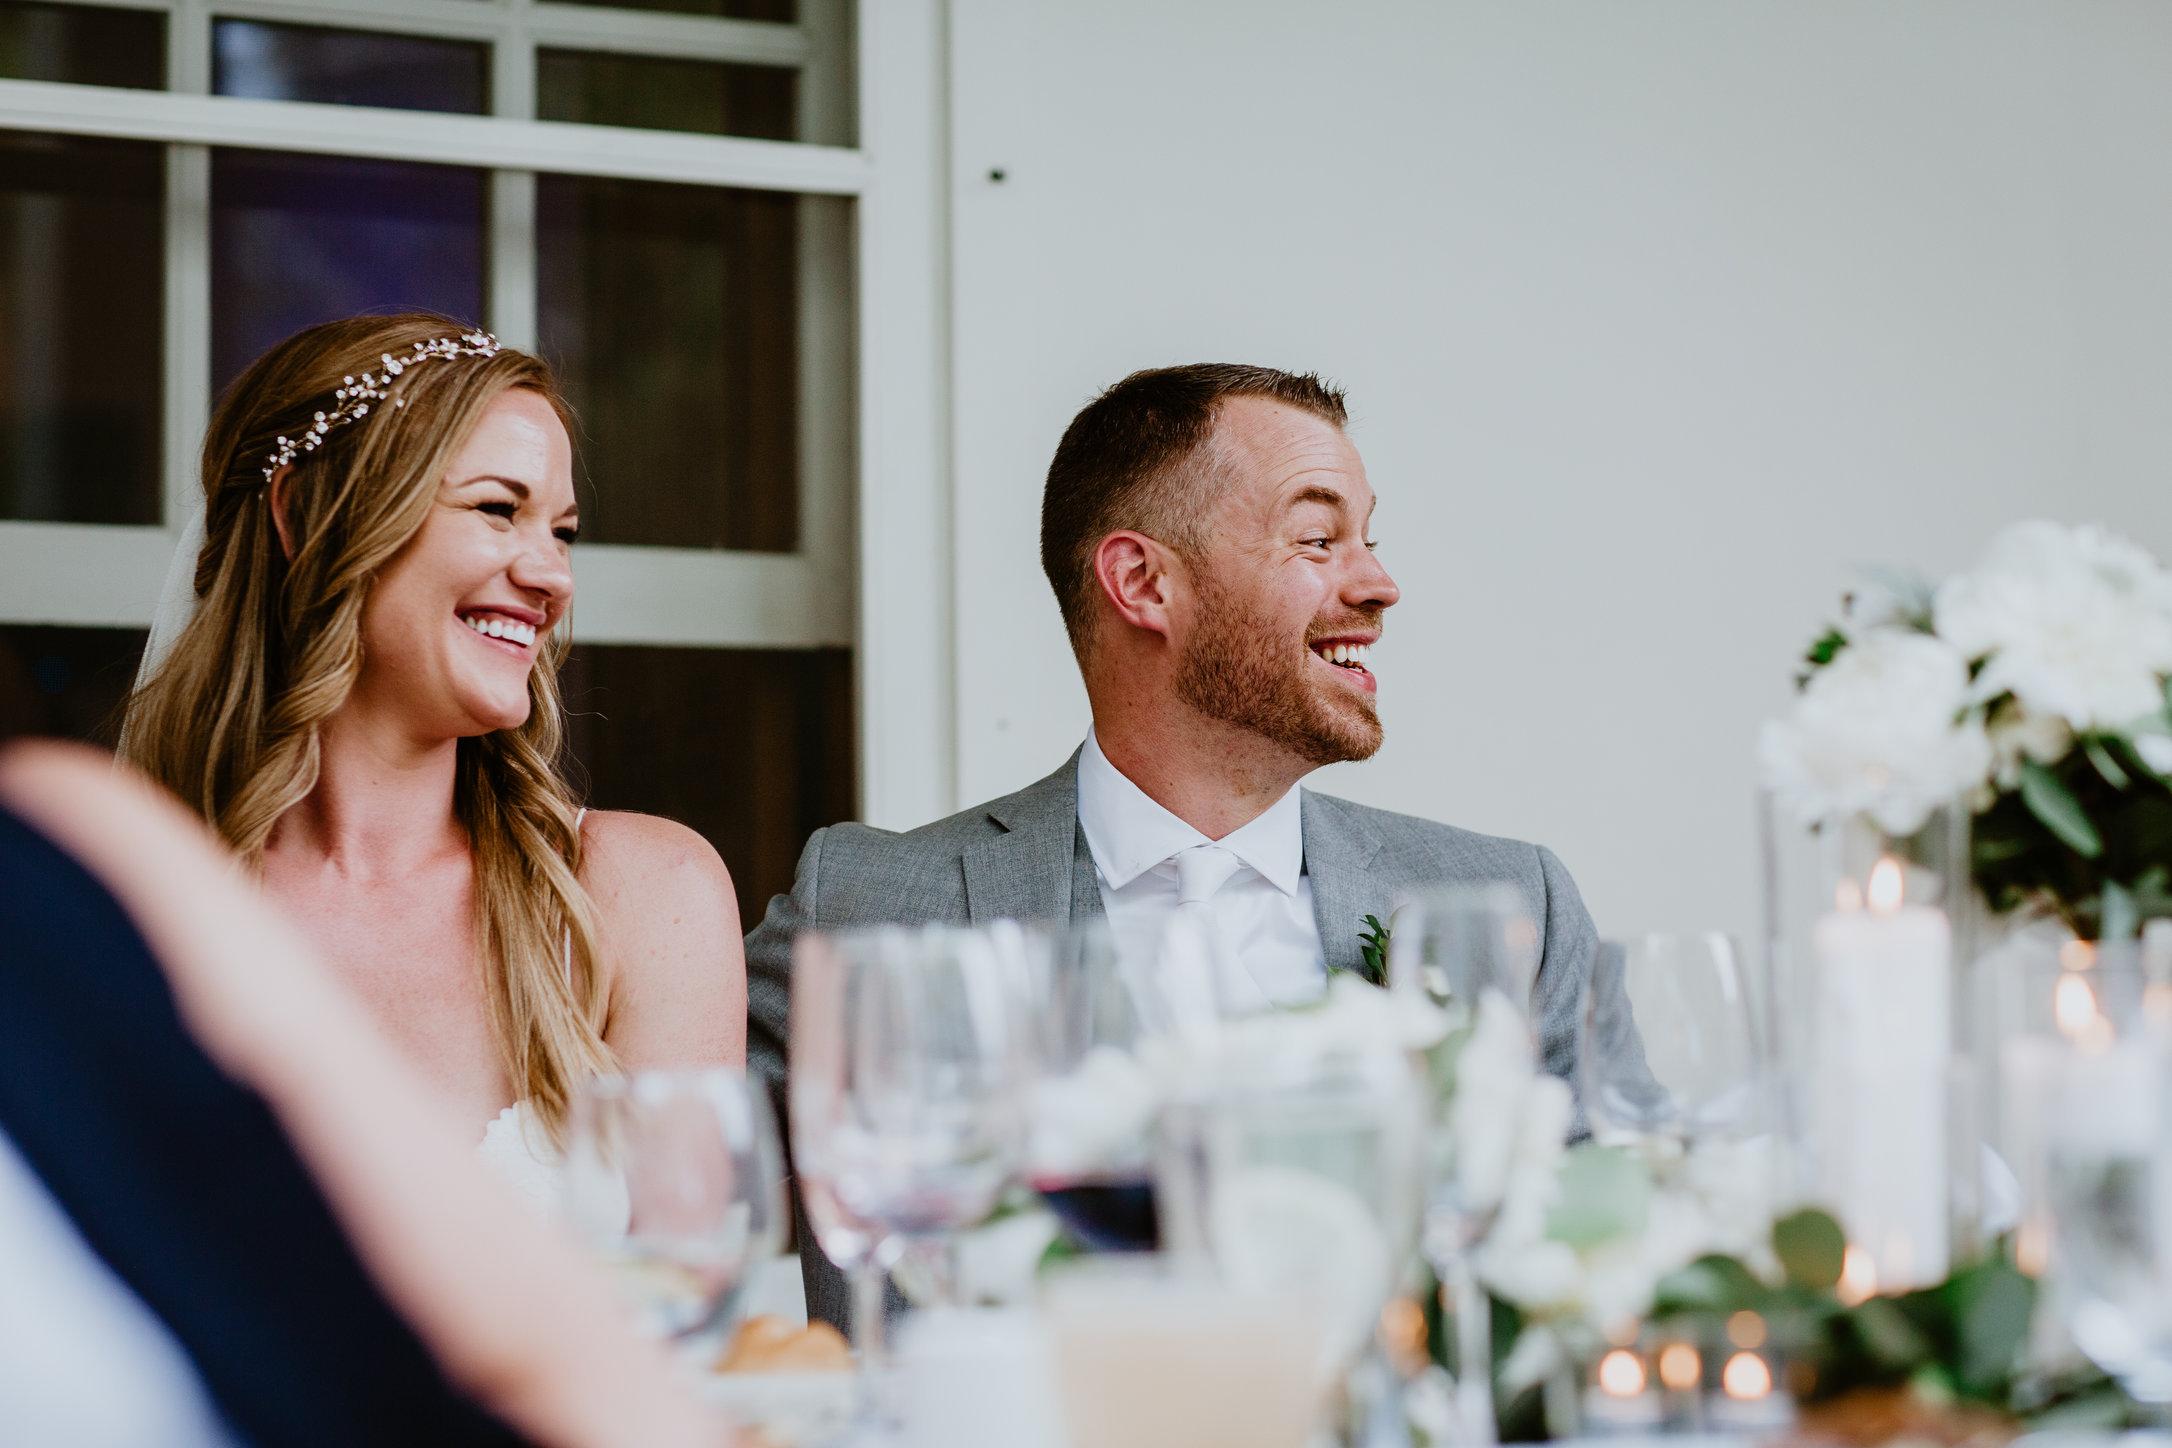 DandA-wedding-683.jpg